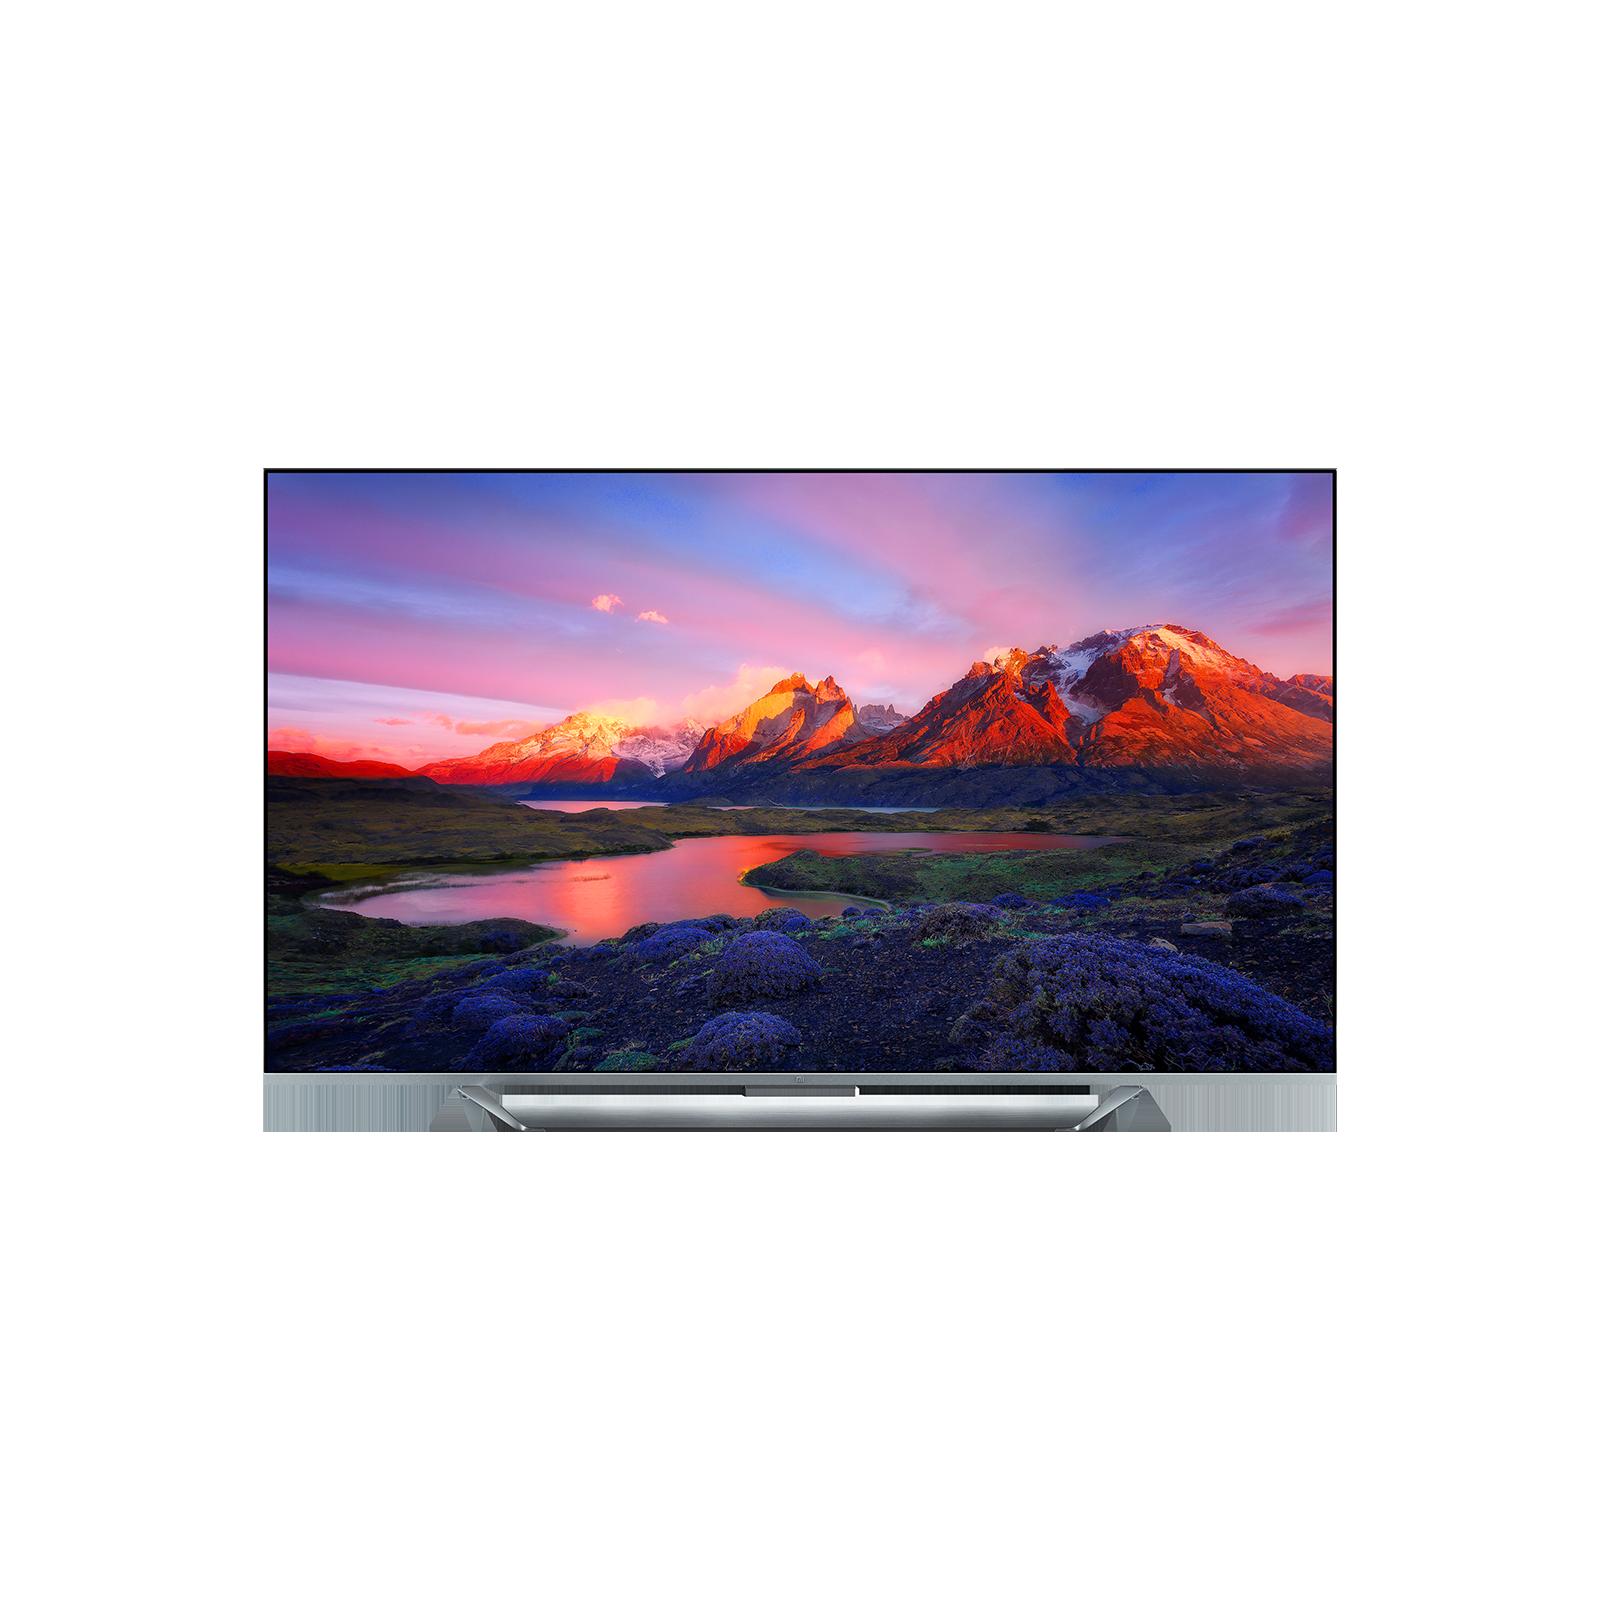 Mi TV Q1 75 75 Inch General